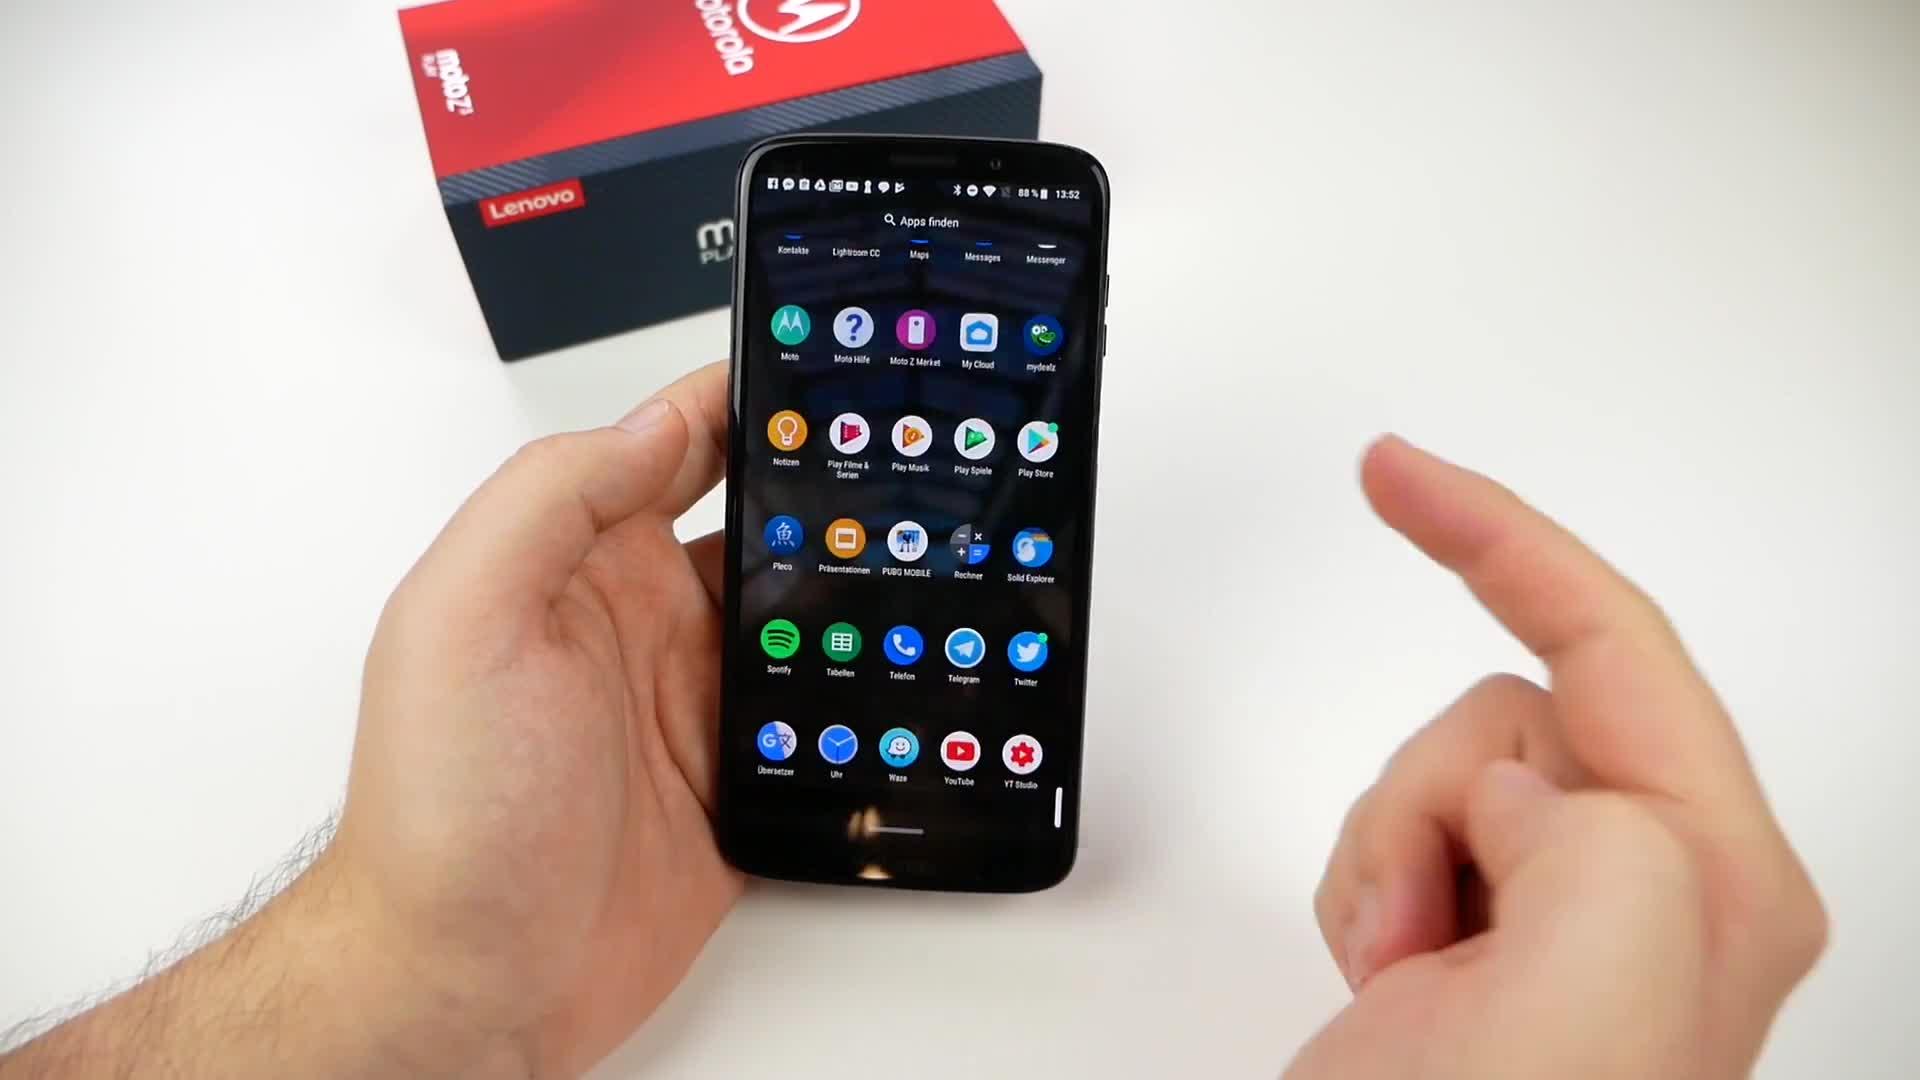 Smartphone, Android, Test, Motorola, Daniil Matzkuhn, tblt, Android 8.1, Android 8.1 Oreo, Moto Mods, Moto Z3 Play, Motorola Moto Z3 Play